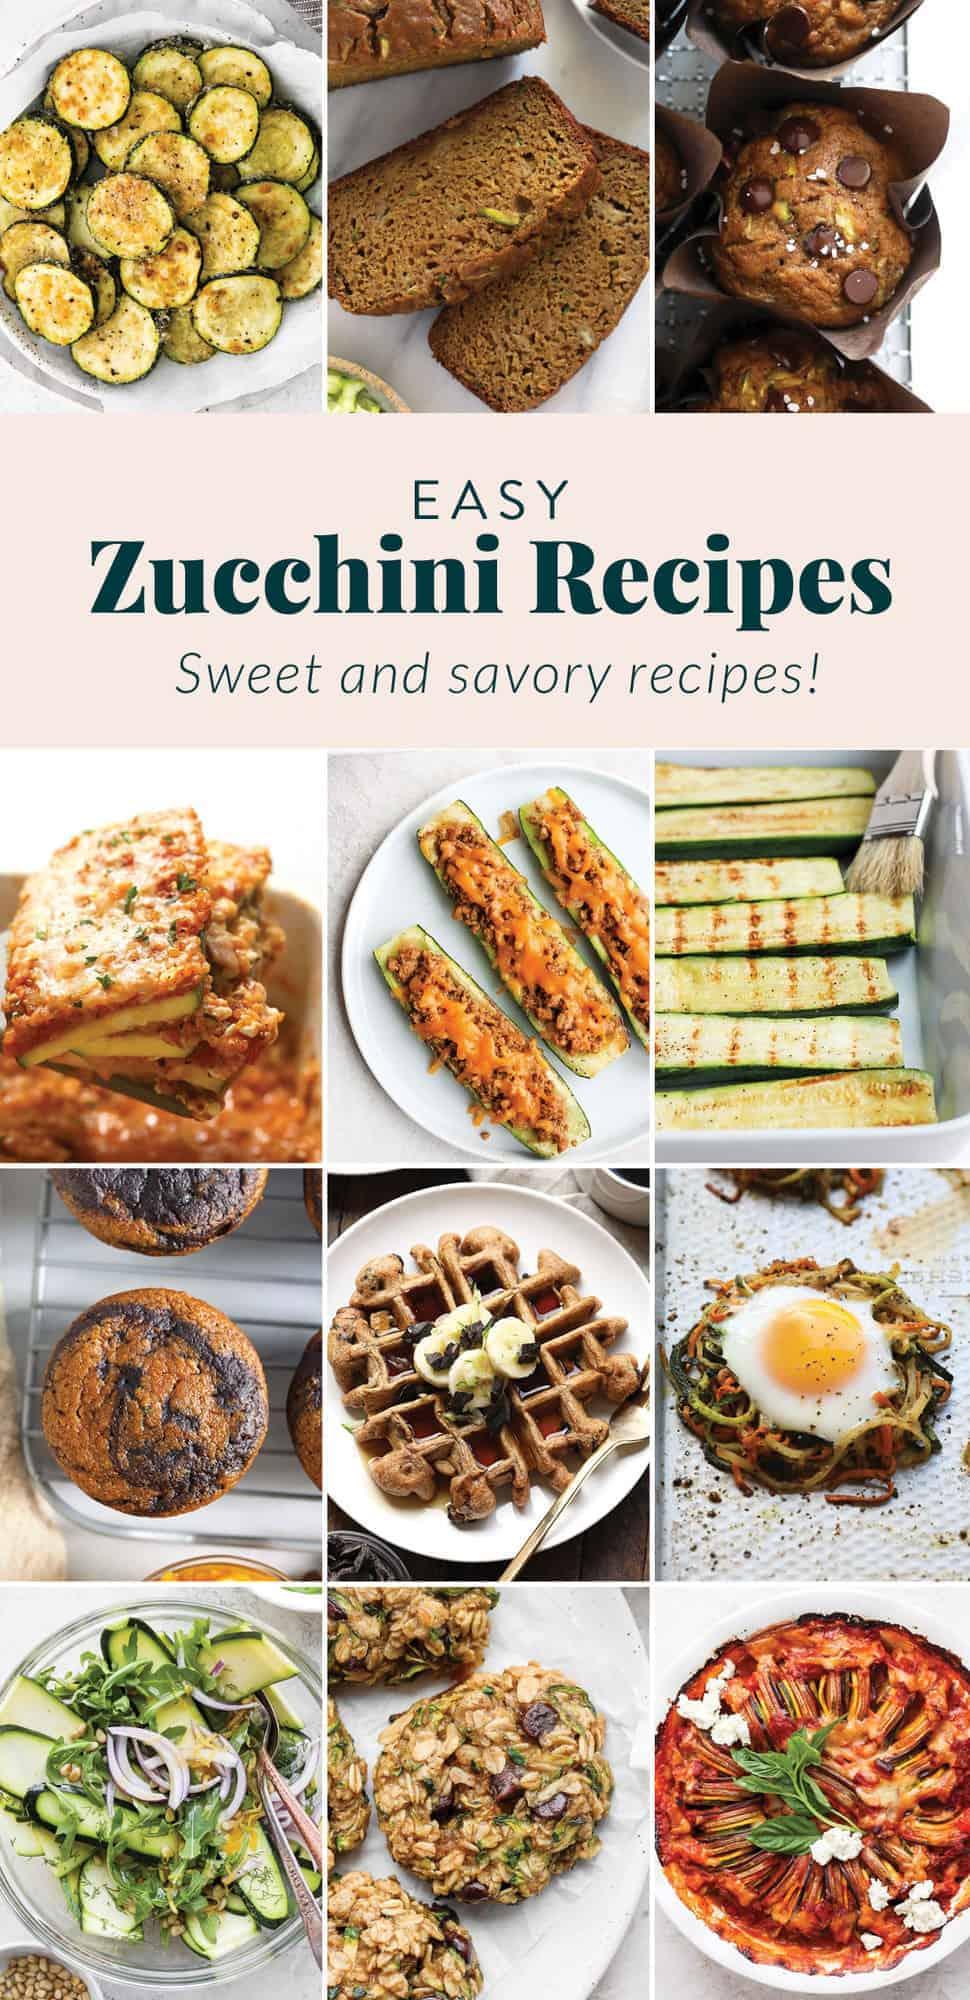 Zucchini recipes in one picture